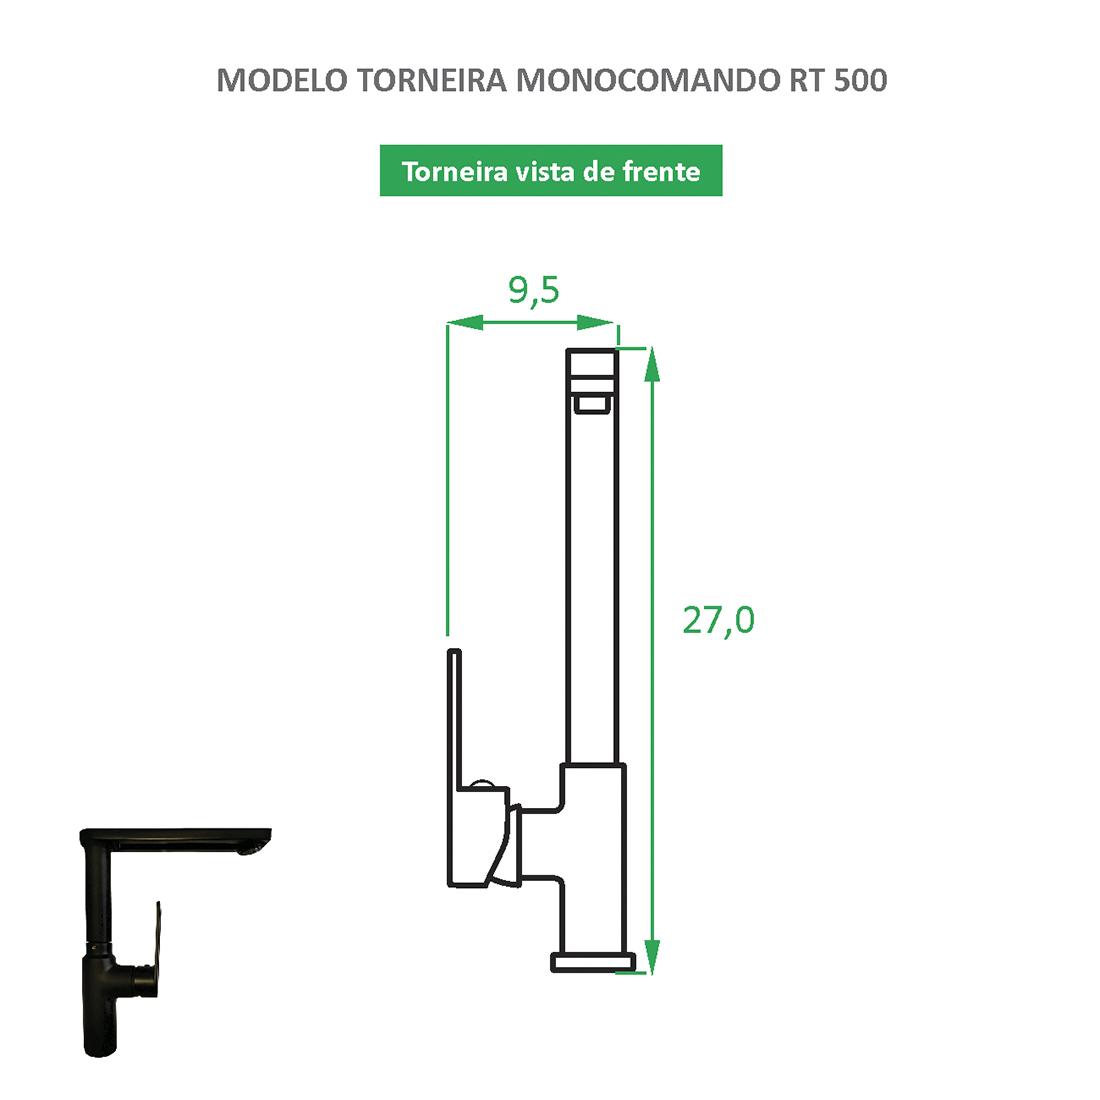 Torneira Monocomando bica alta RT 500 preta fosca